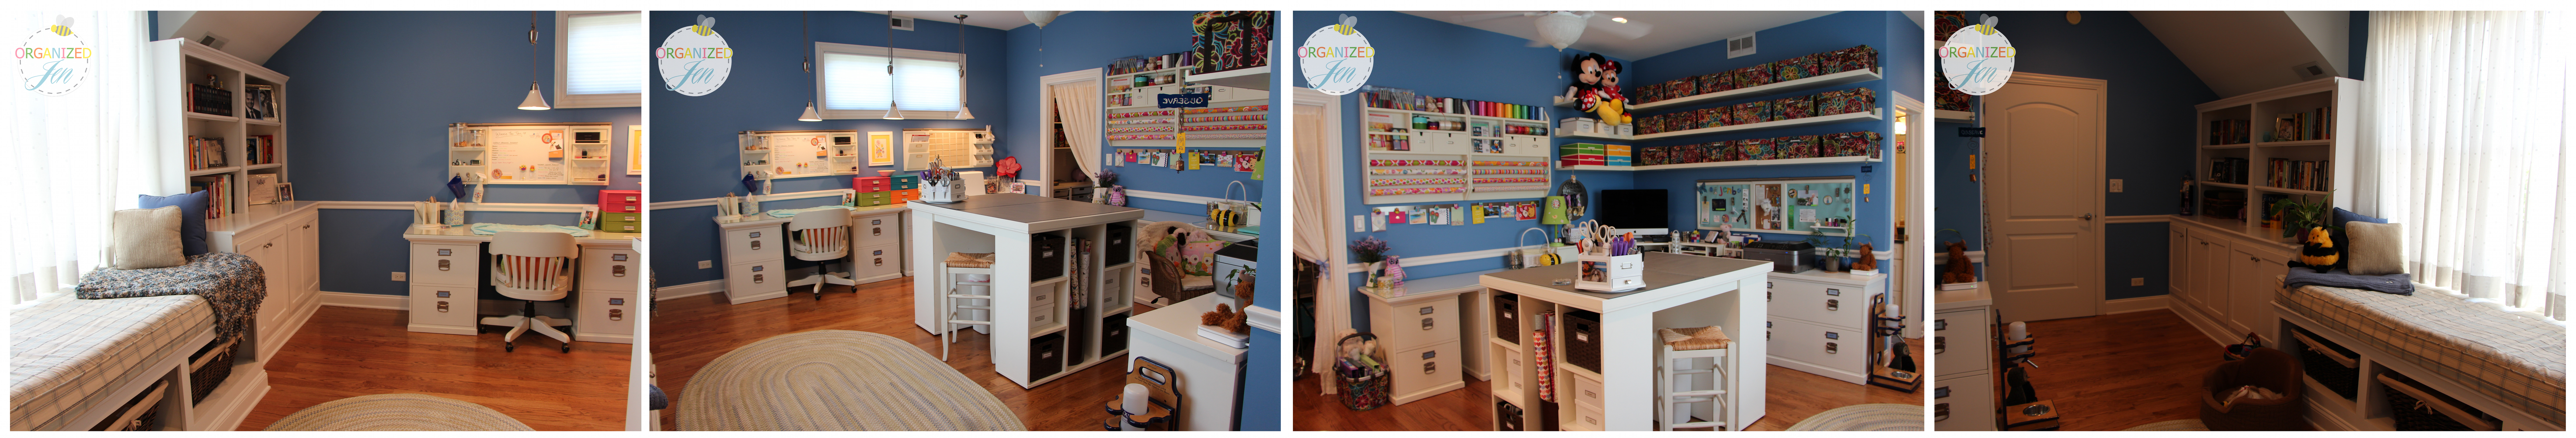 craft room ideas bedford collection. OJ|OLJ 6:28:2013_1 Craft Room Ideas Bedford Collection S